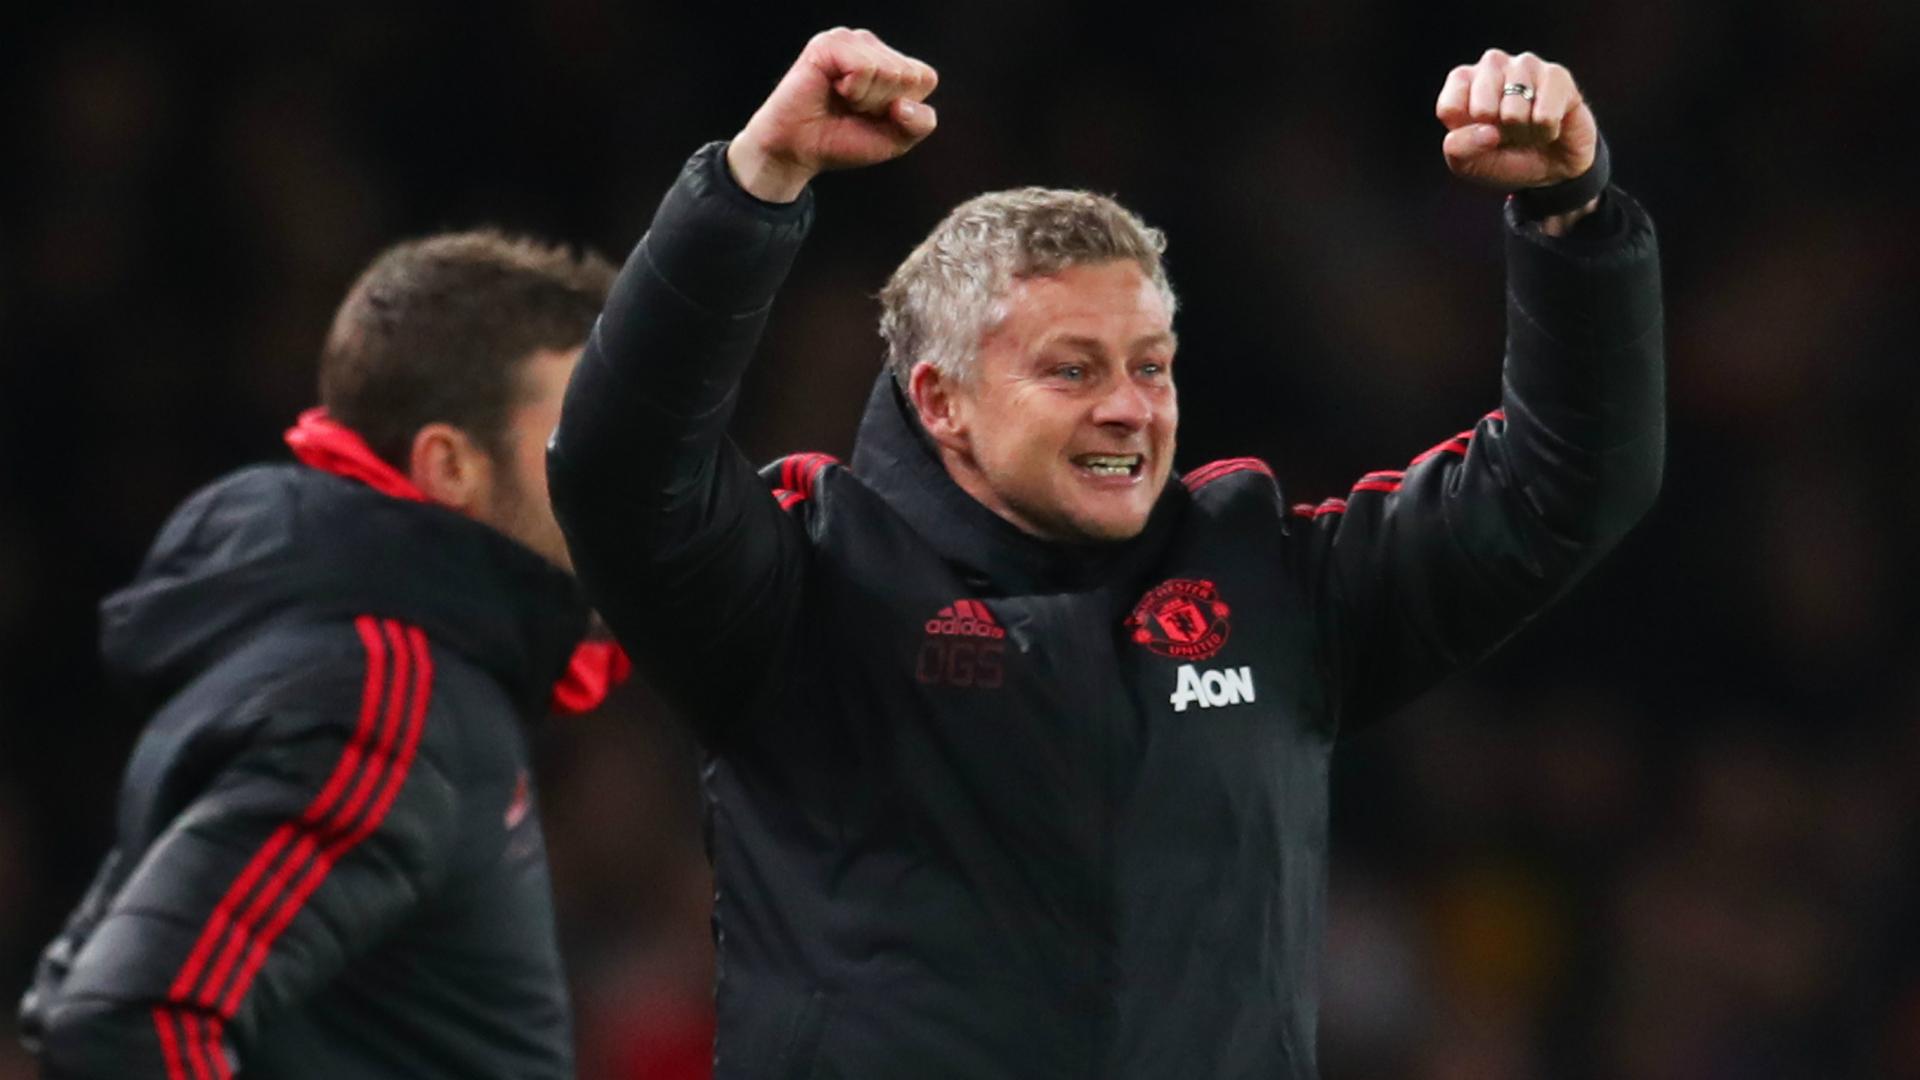 Manajer interim Manchester United, Ole Gunnar Solskjaer